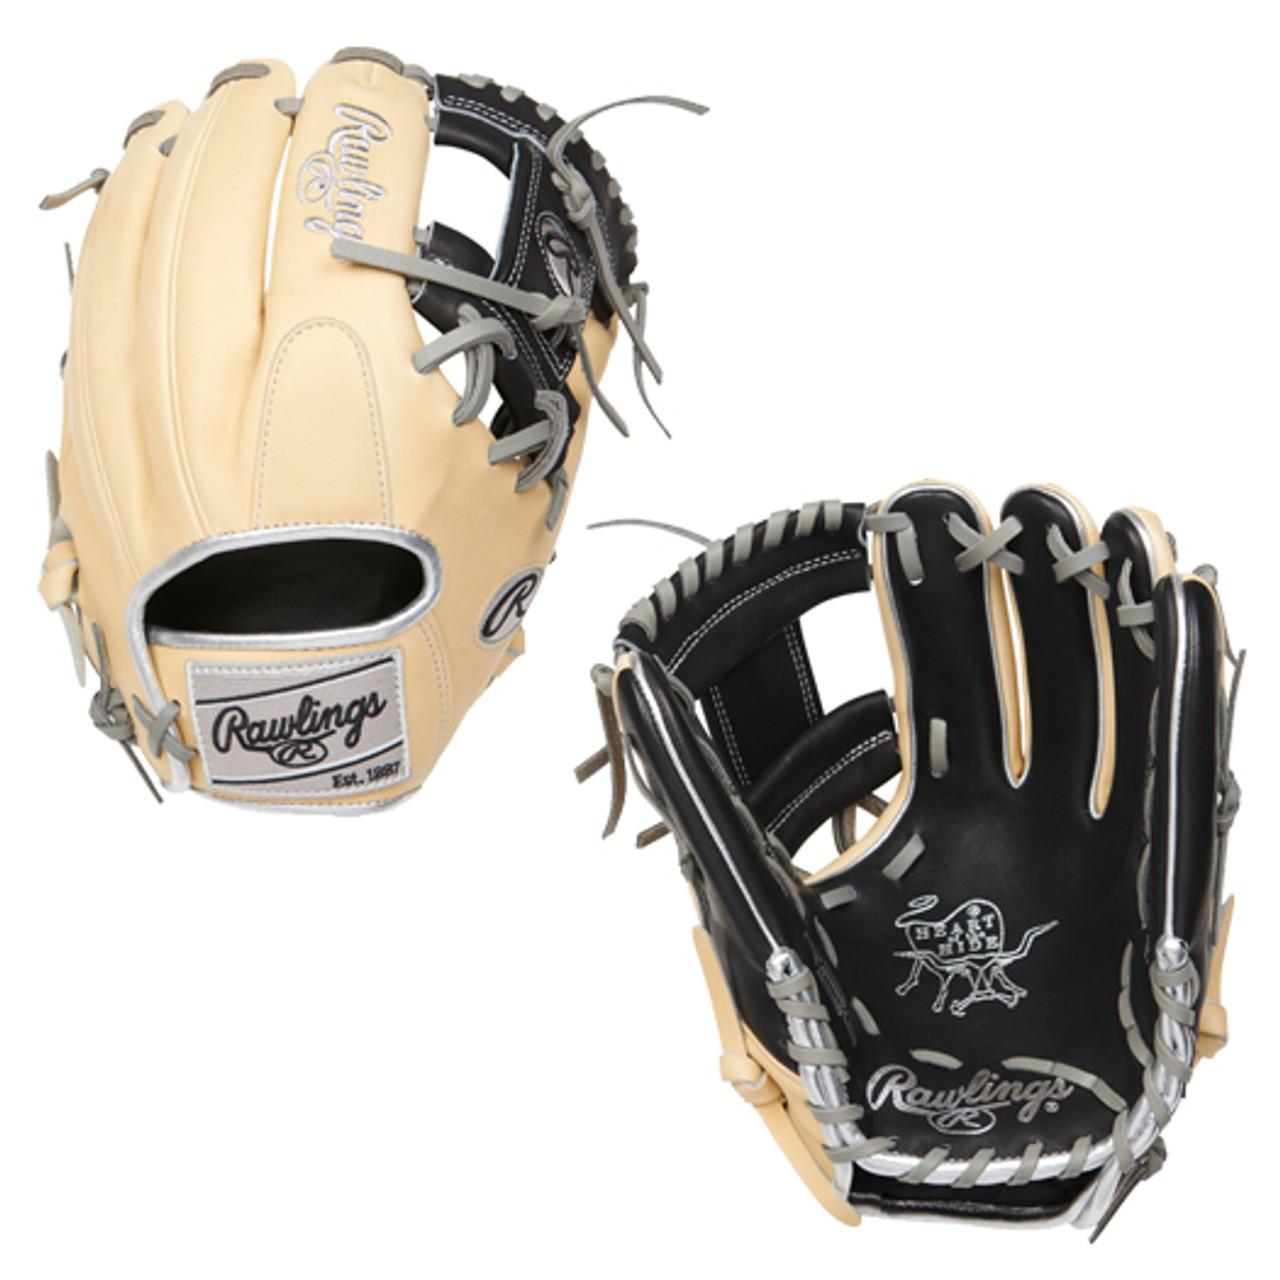 PRORFL12 PRORFL12 Rawlings Heart of The Hide R2G 11.75 Francisco Lindor Baseball Glove